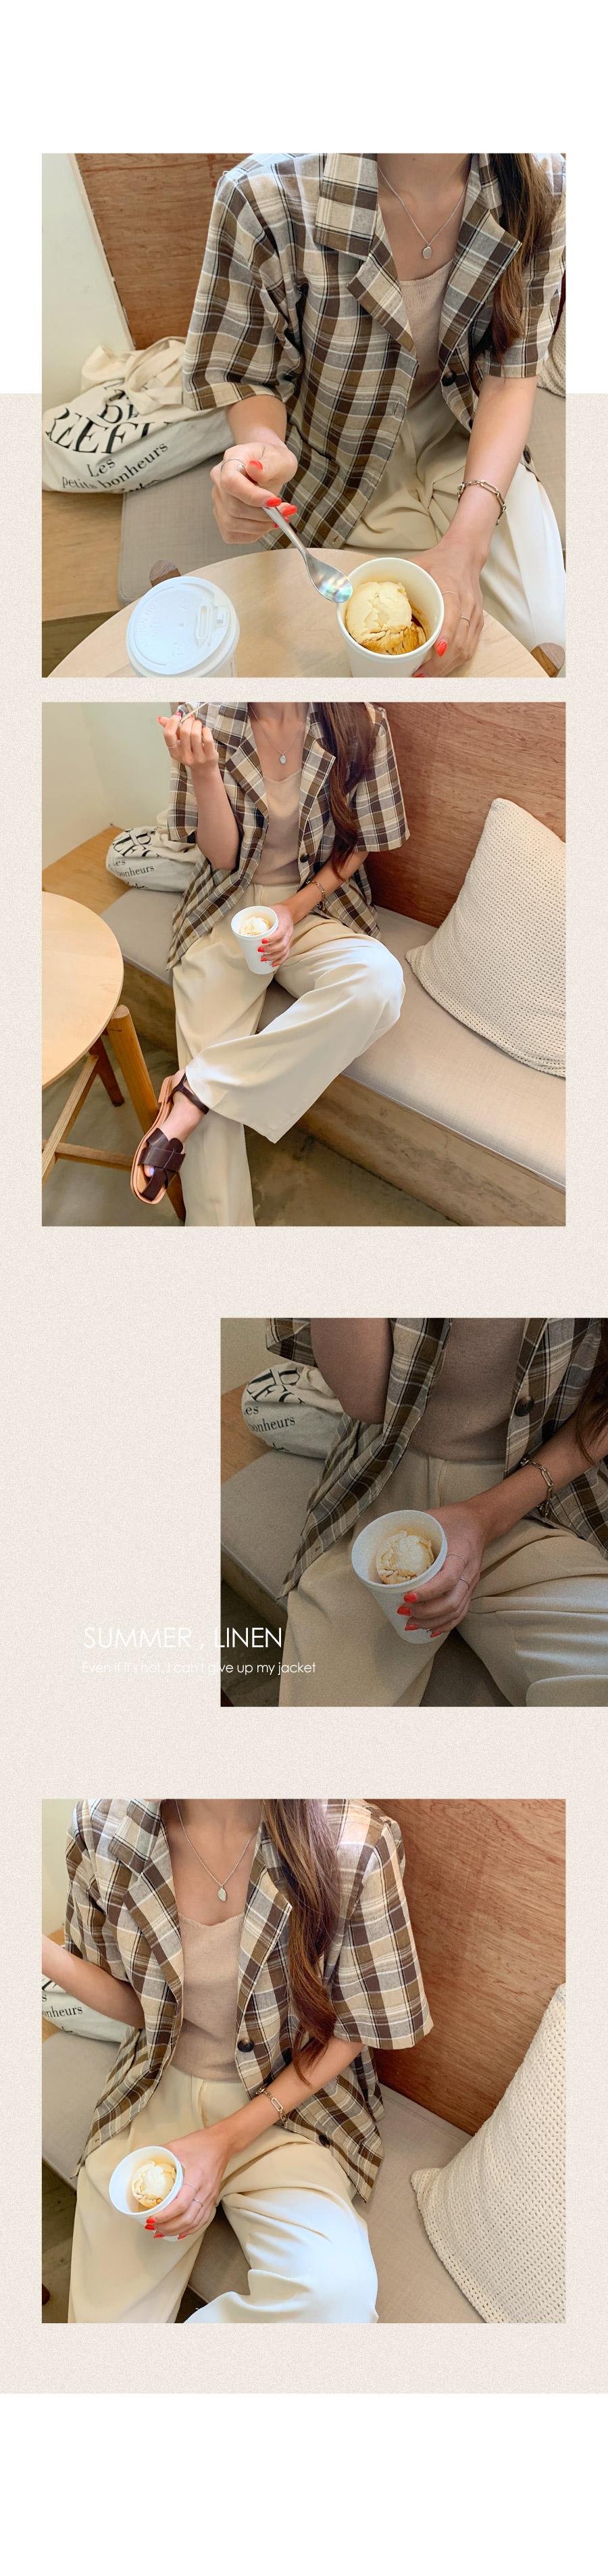 Loel wide long slacks banding trousers